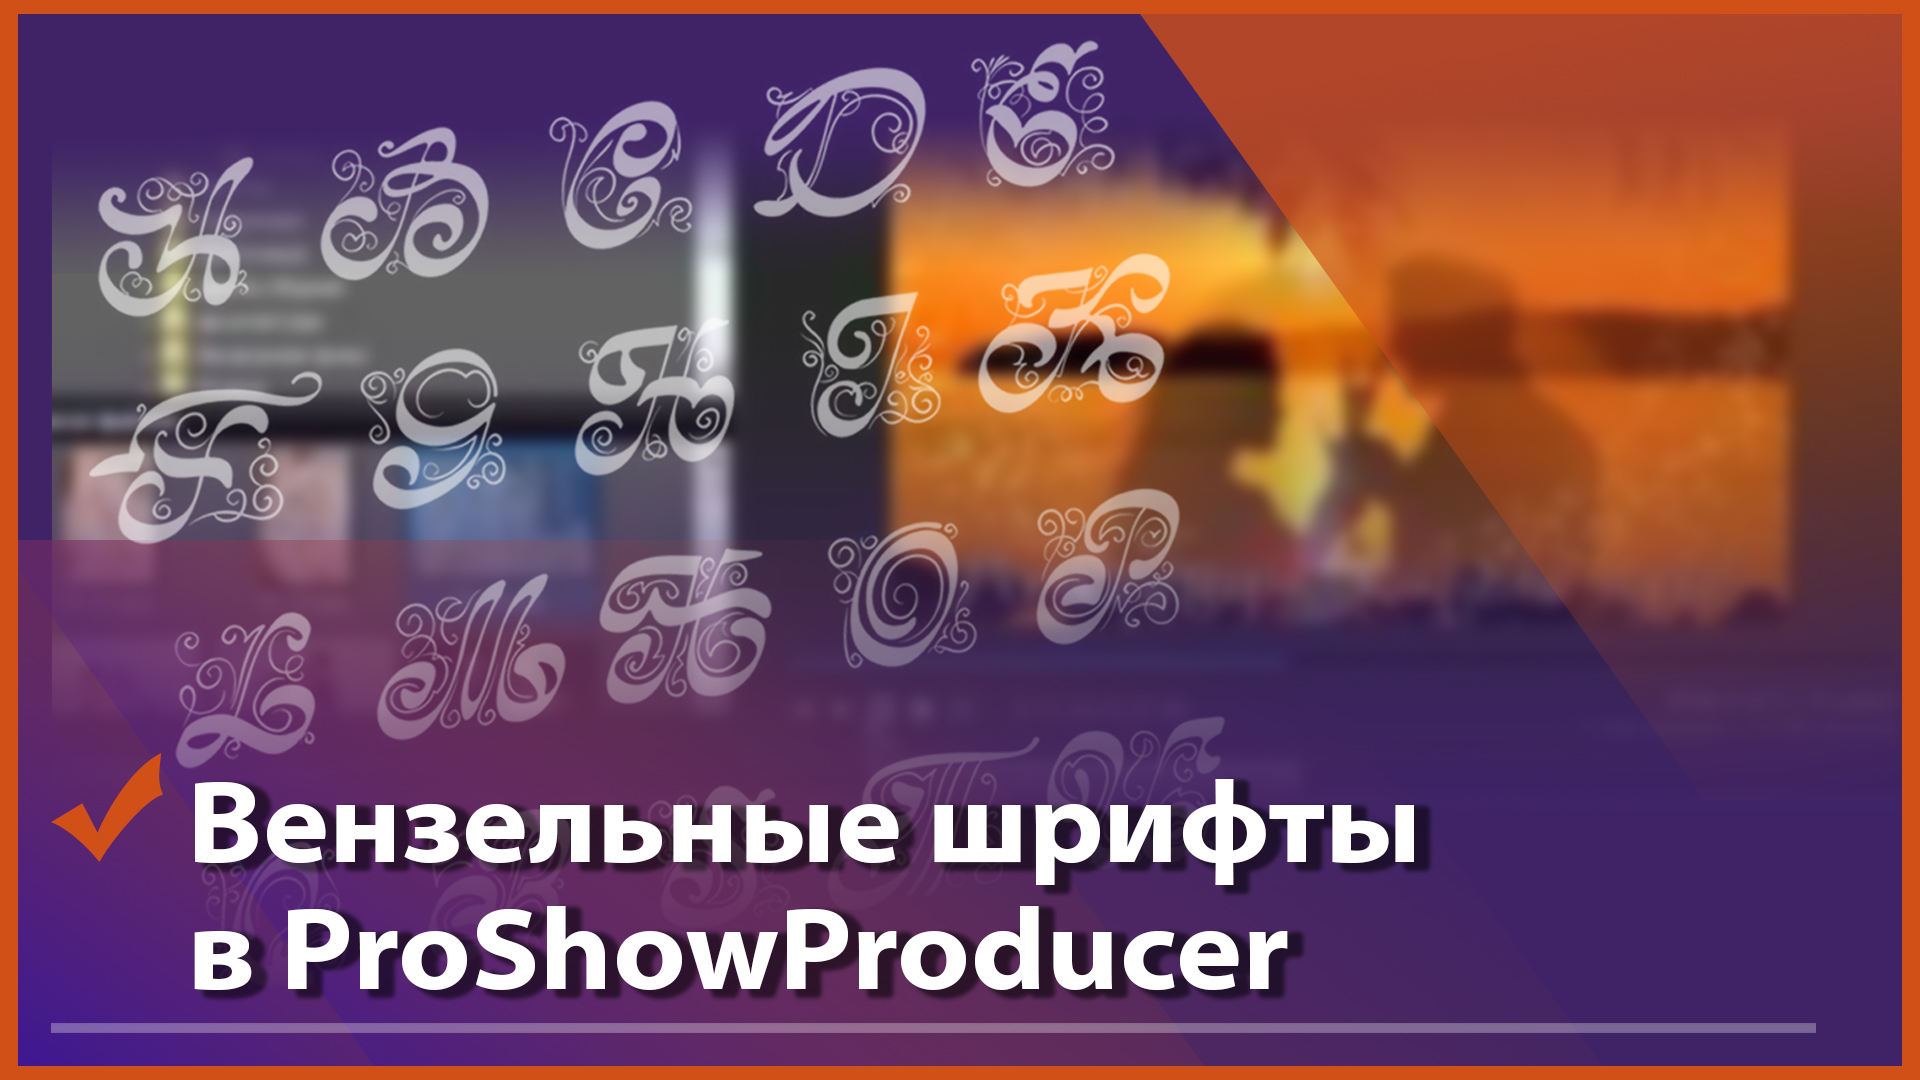 Шрифты для ProShowProducer